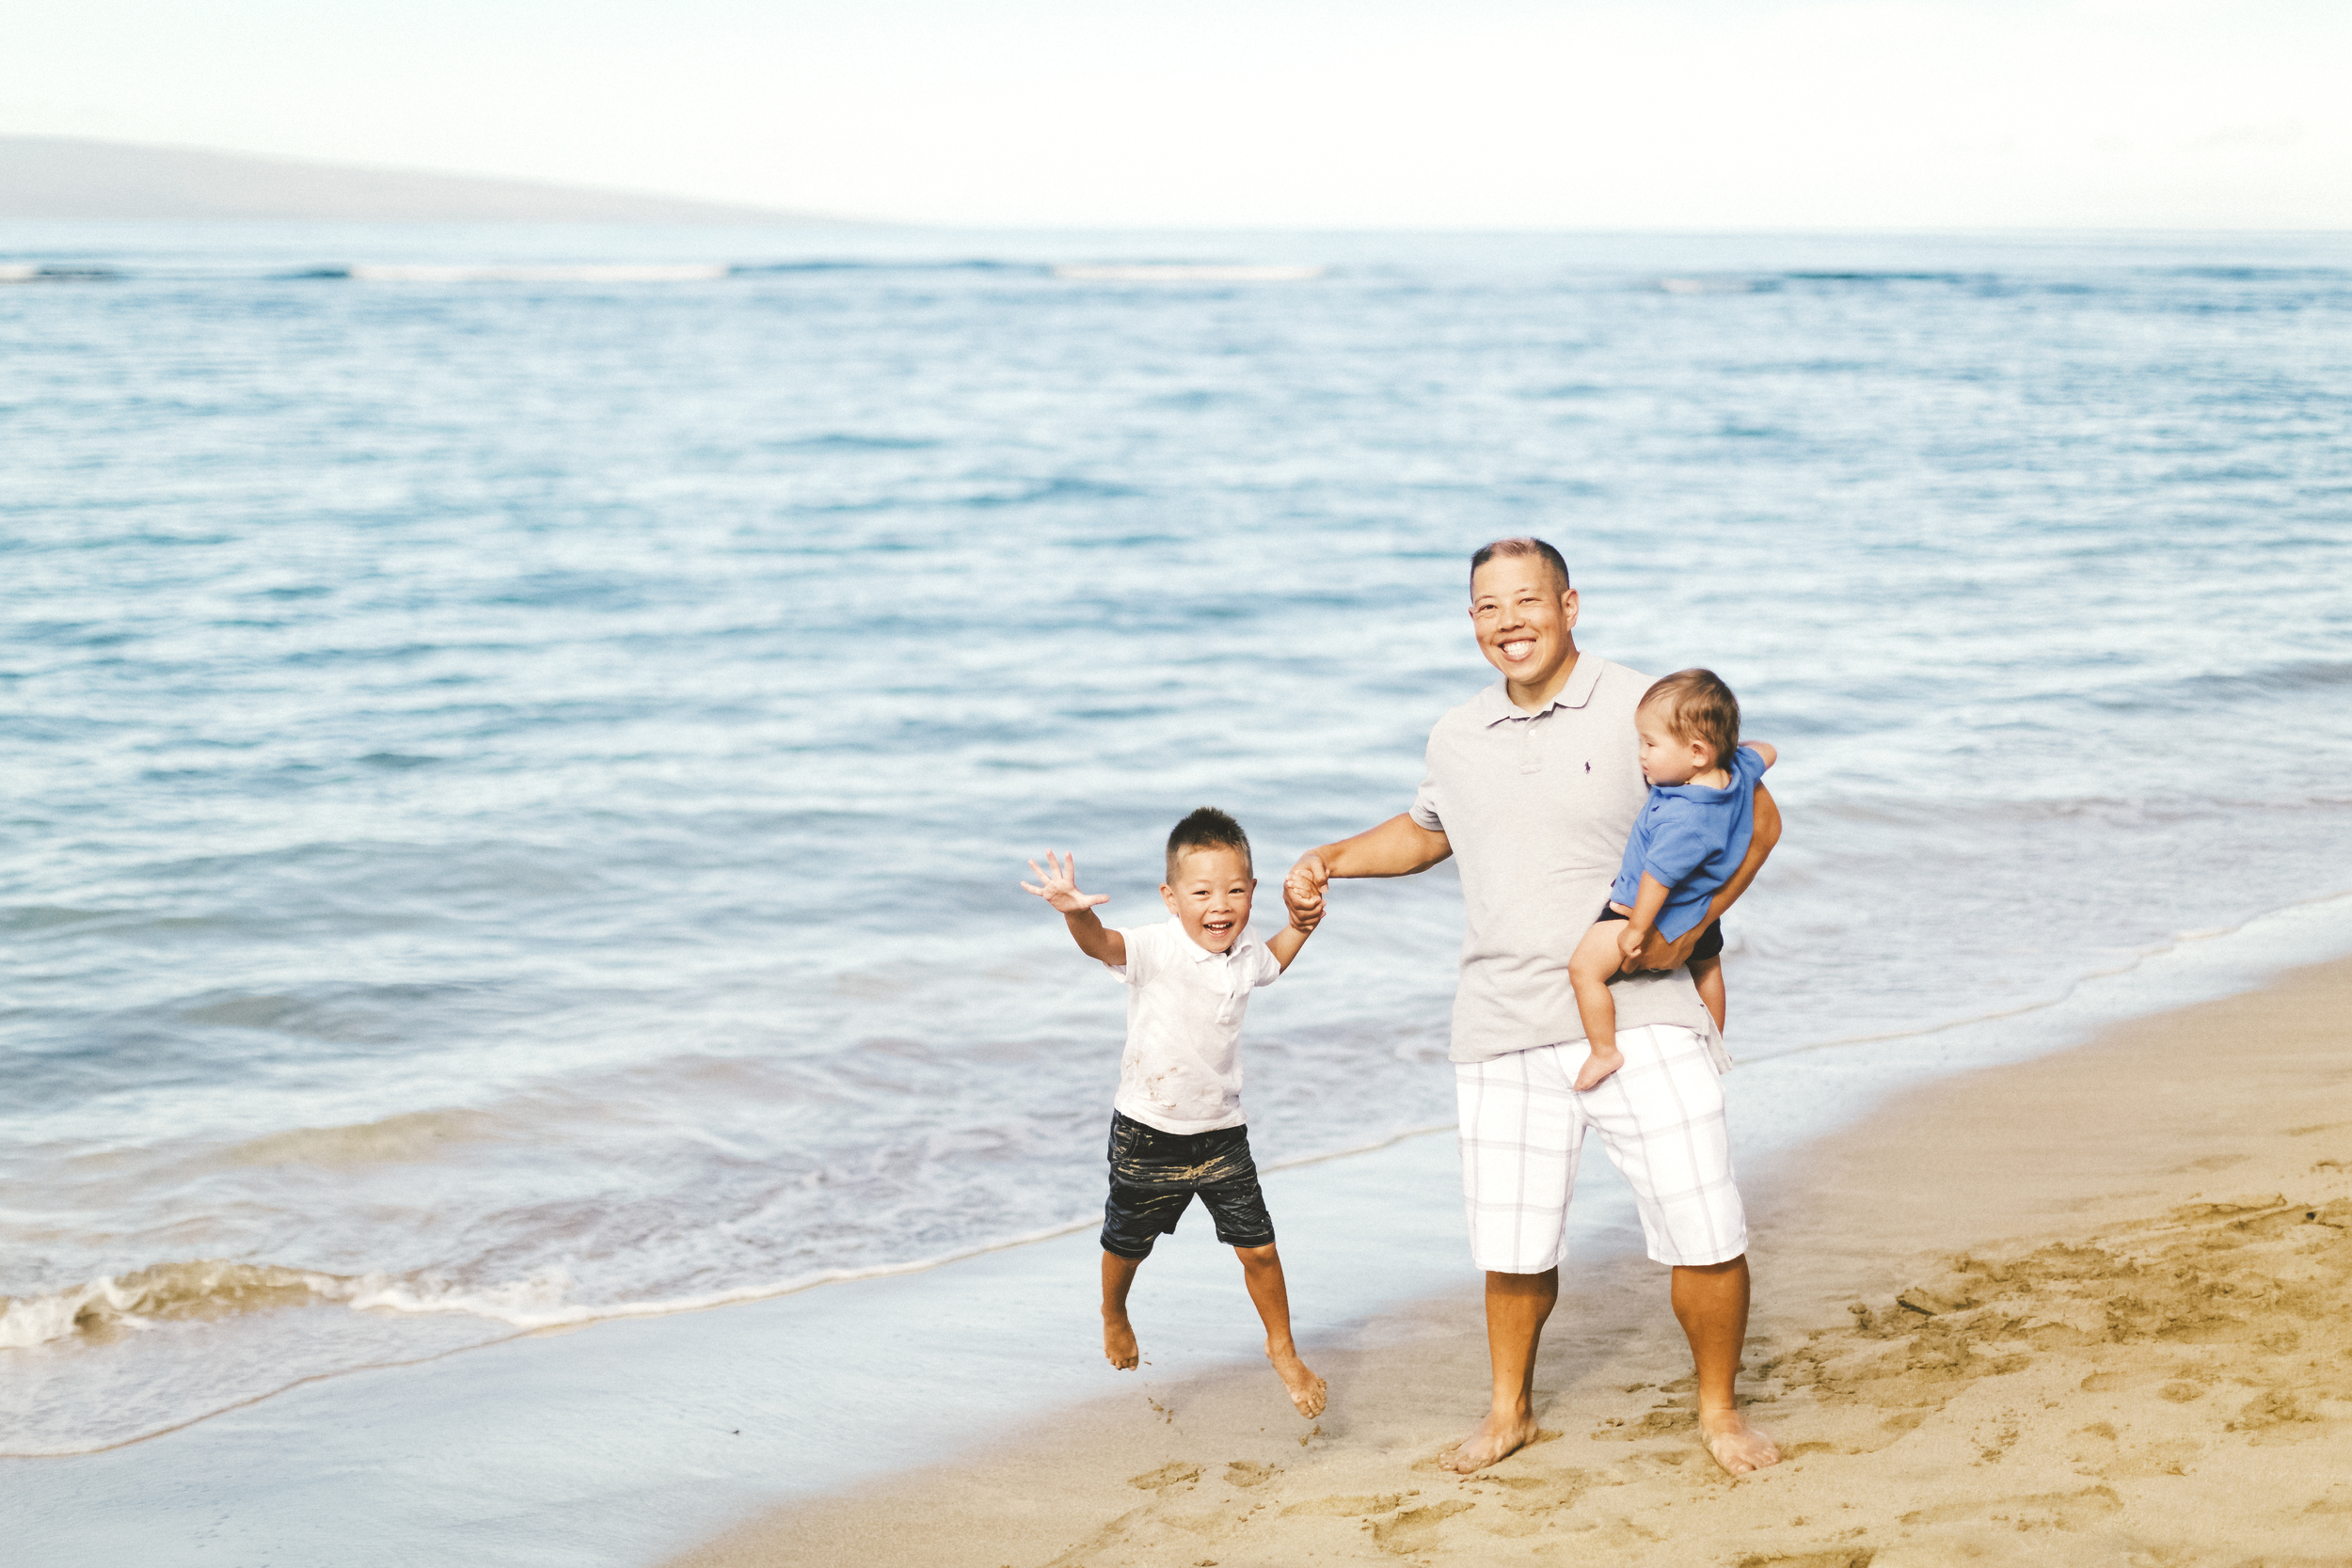 AngieDiaz|beachfamilysession074copy.jpg